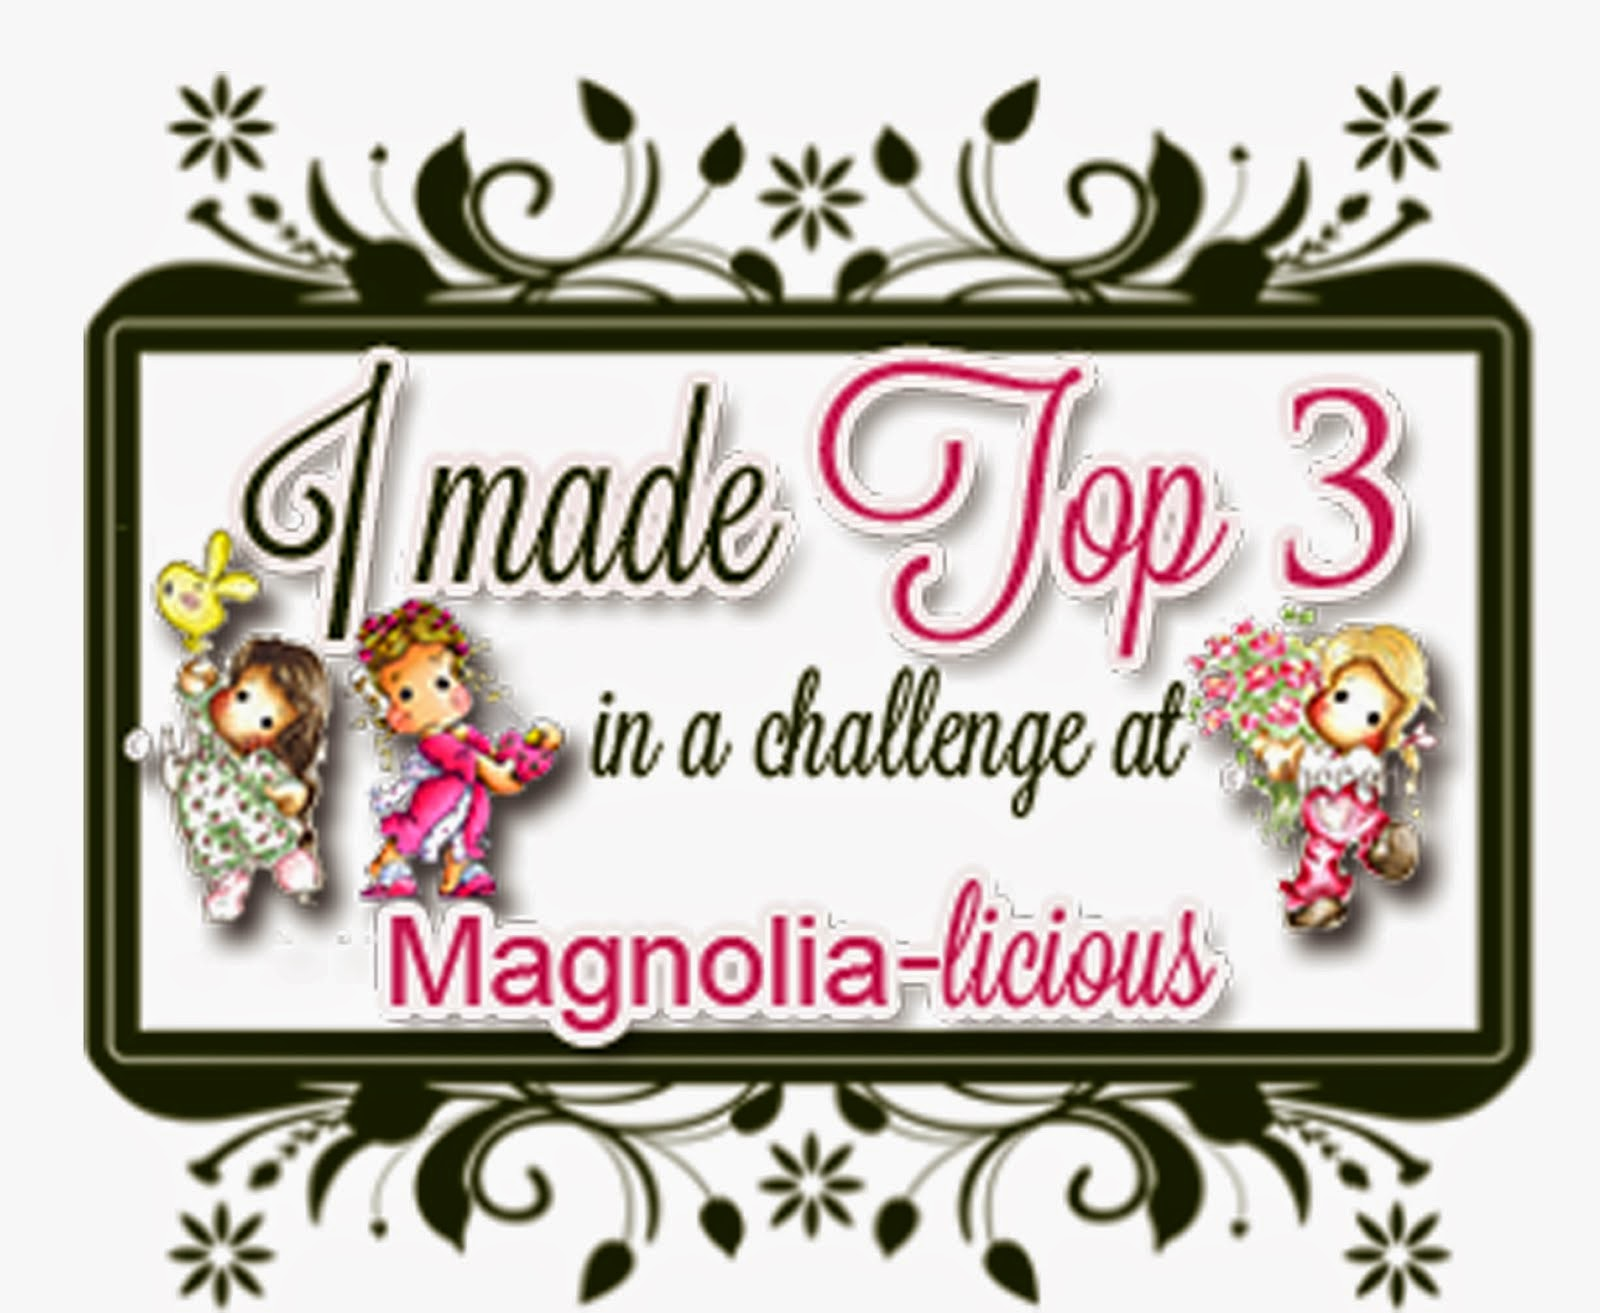 Magnolia-Licious Chellenge blog